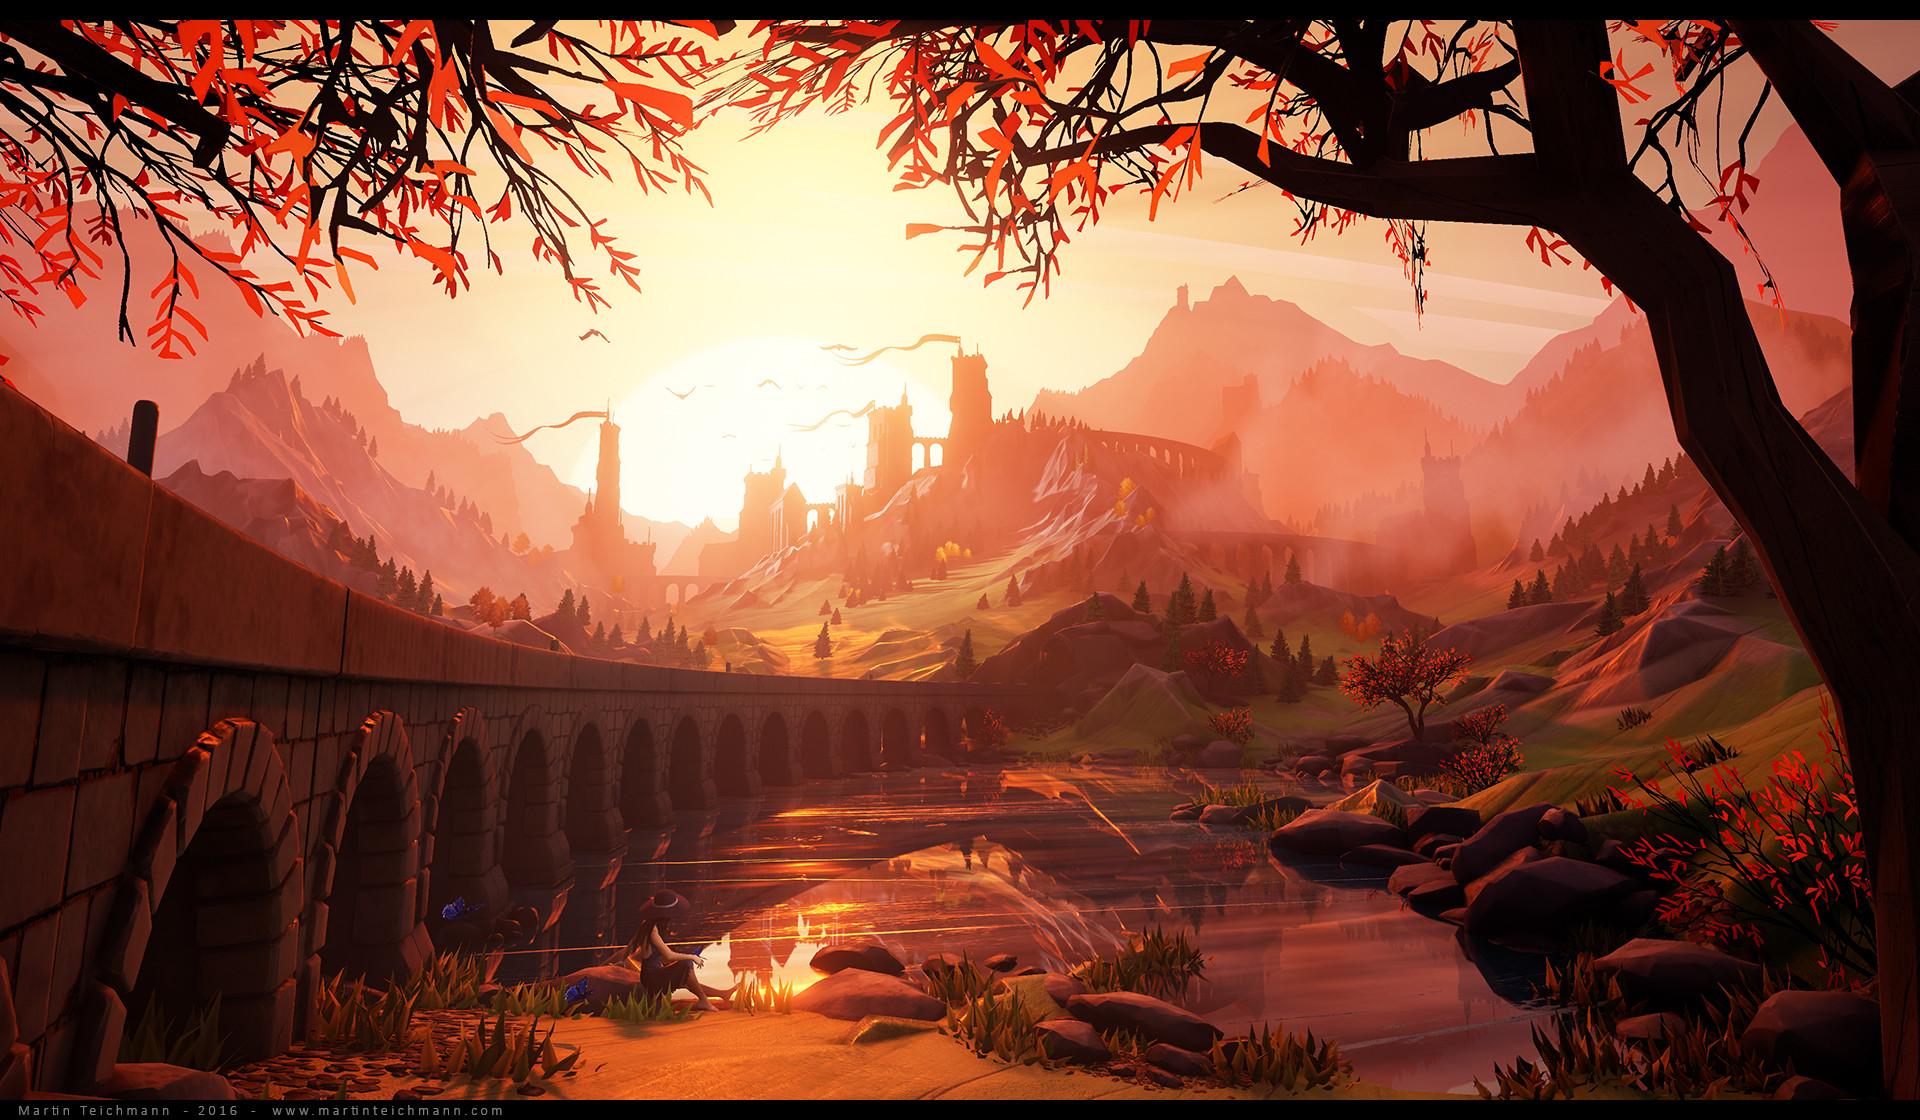 Martin teichmann sunrise landscape 01